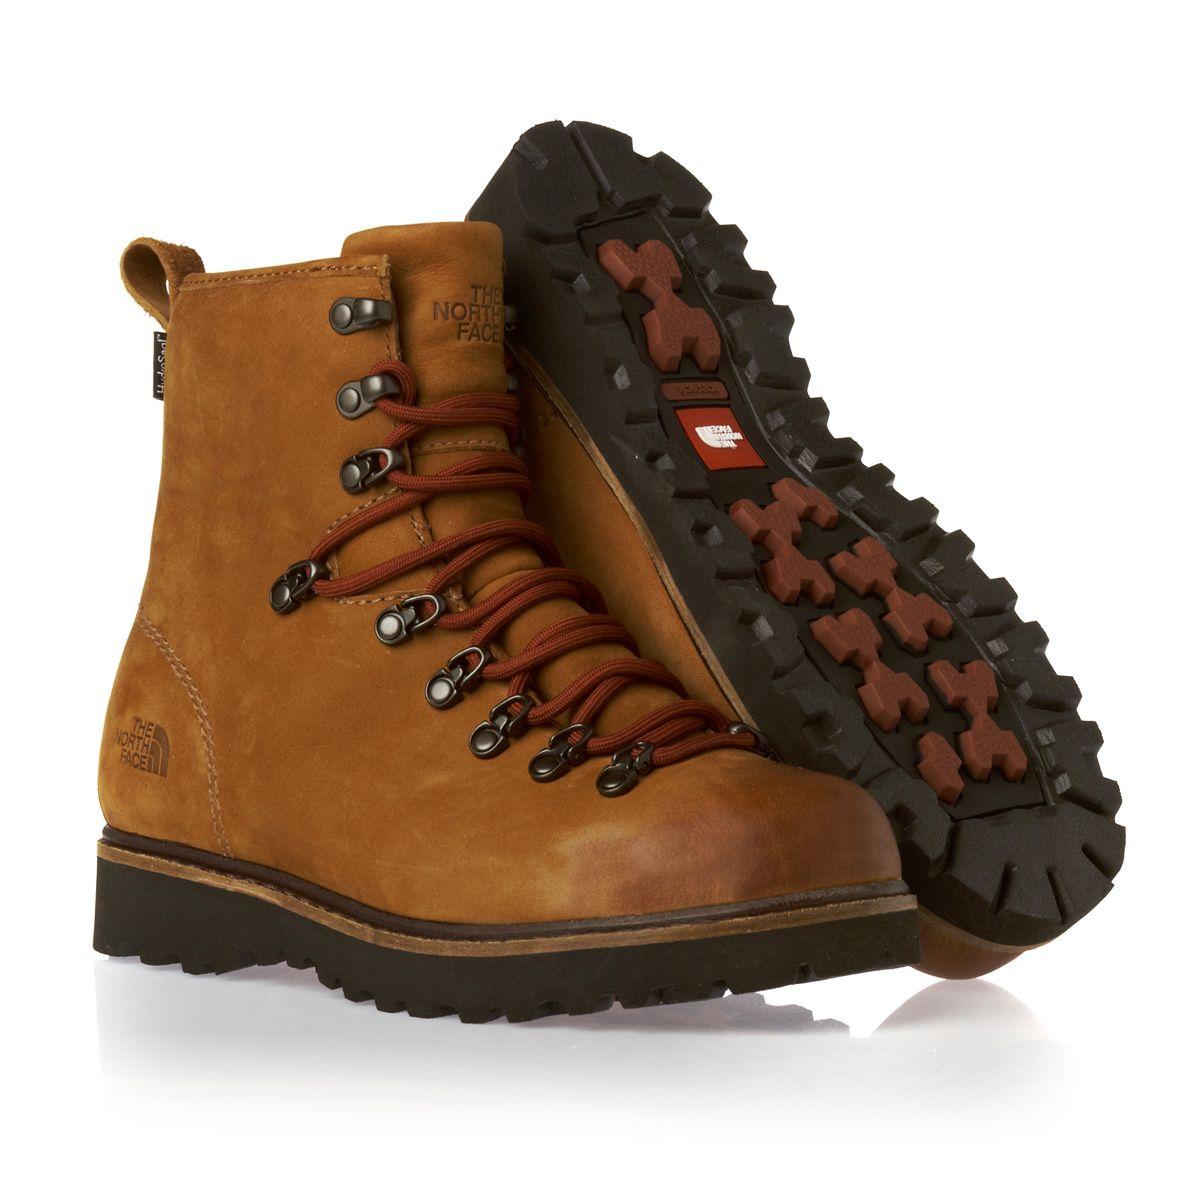 395109560 The North Face Ballard Boots - Camel Brown/Slickrock Red. Full ...